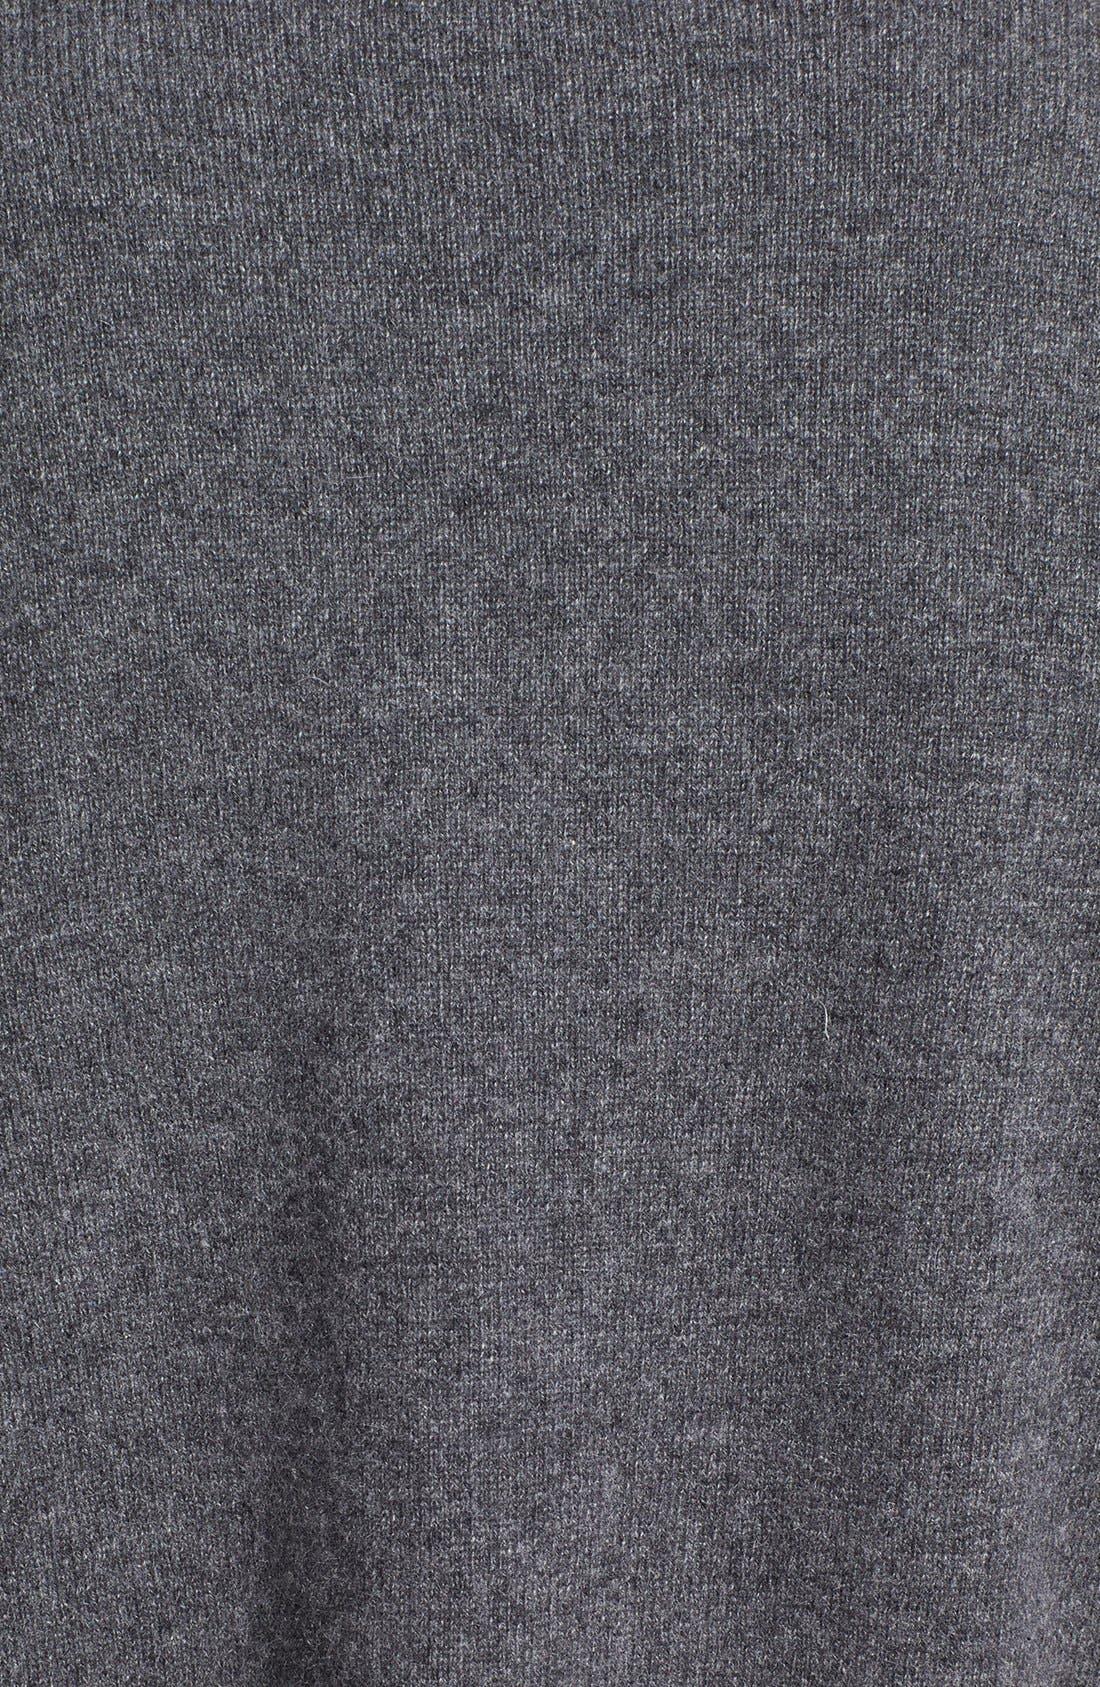 Alternate Image 3  - Halogen® Wool & Cashmere Shrug (Regular & Petite)